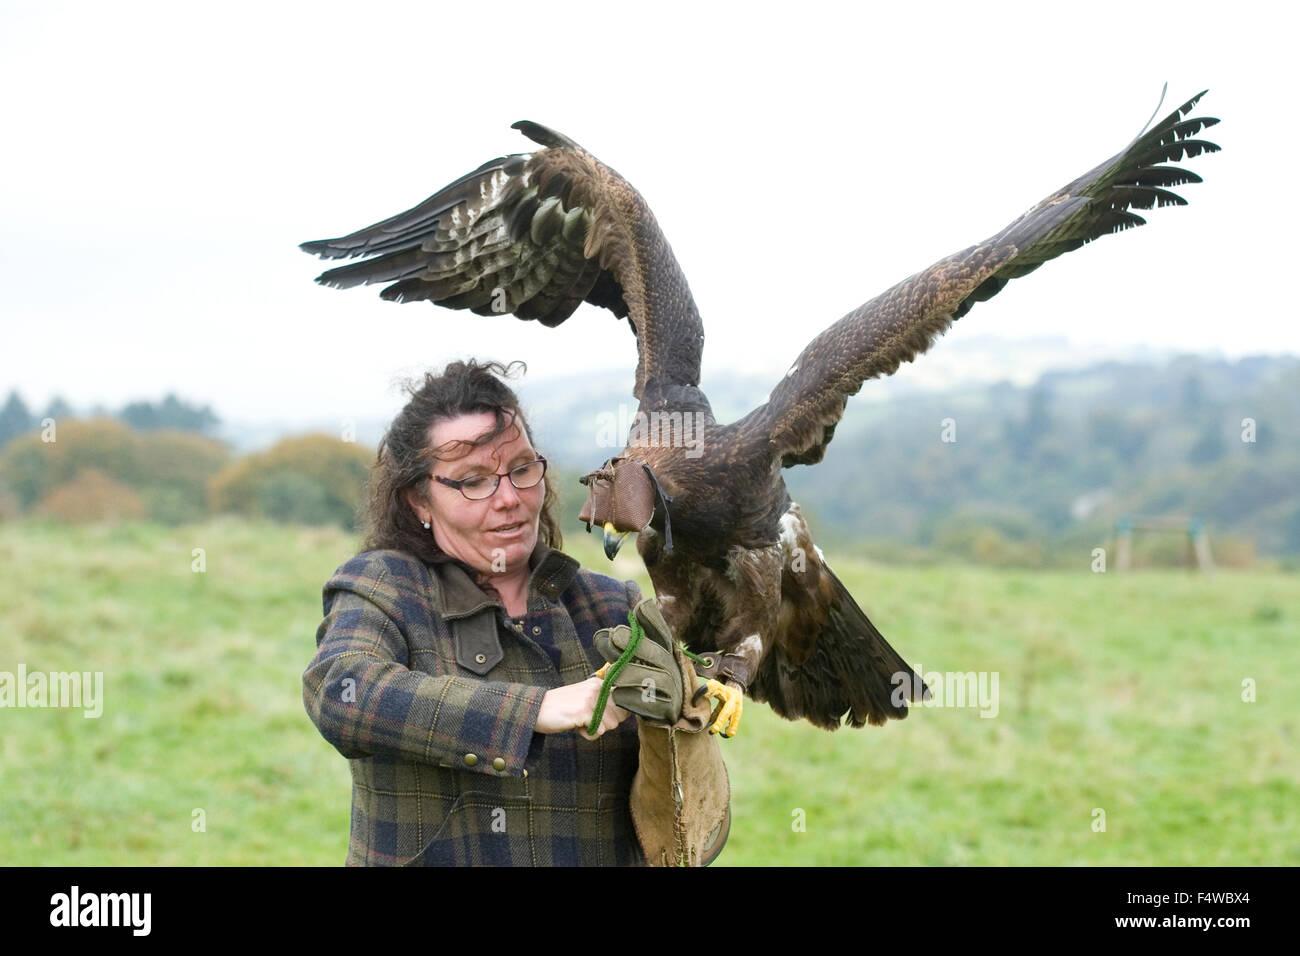 female falconer with eagle - Stock Image